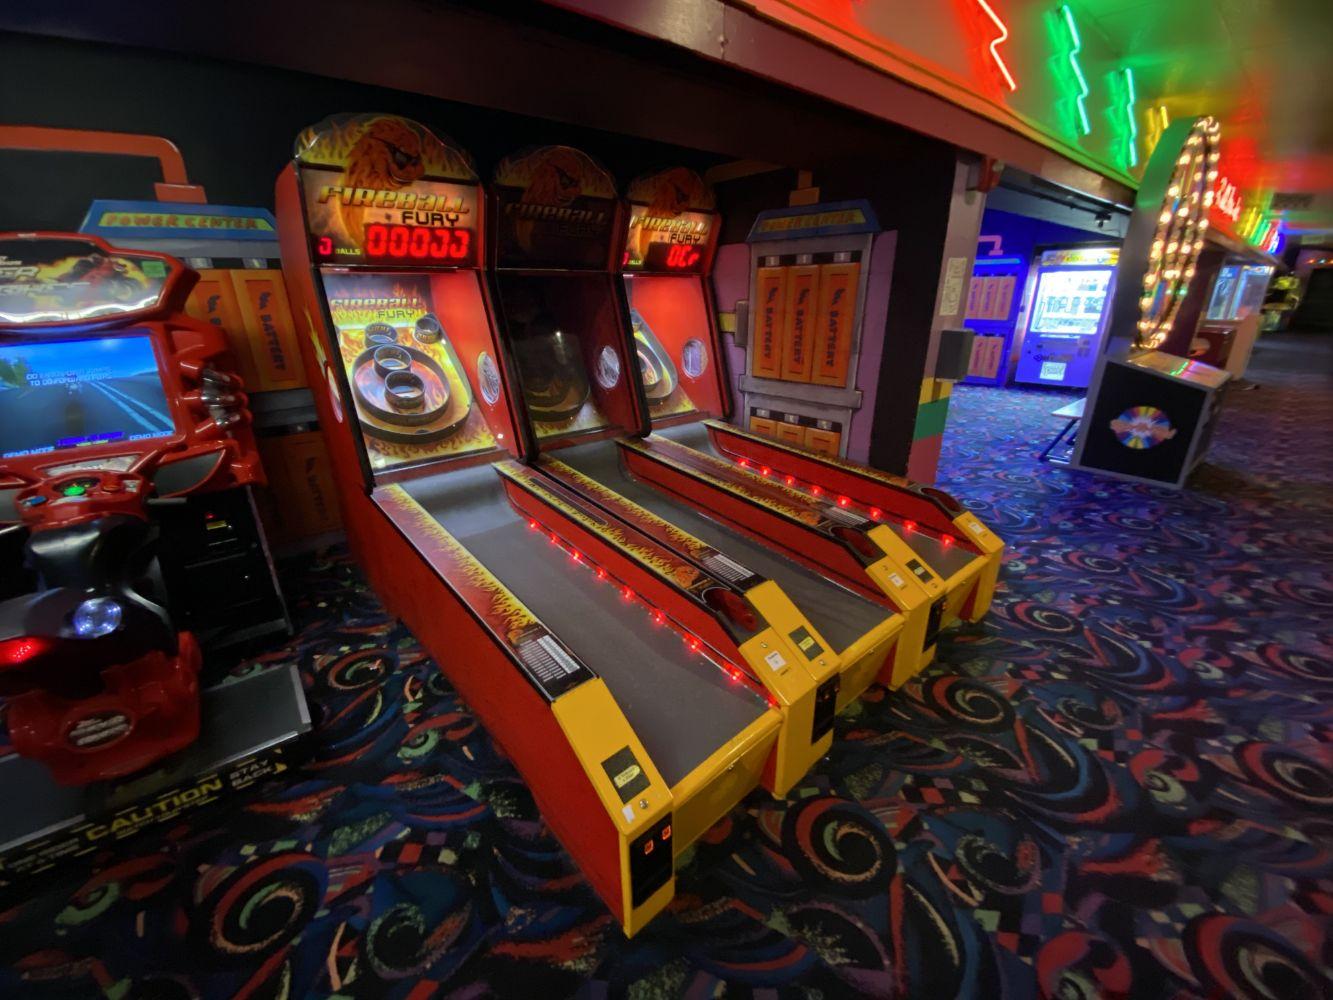 INDOOR ROLLER SKATE PARK - AMUSEMENTS - ARCADE GAMES - AUDIO/VIDEO - REST. EQUIP. - LASER TAG